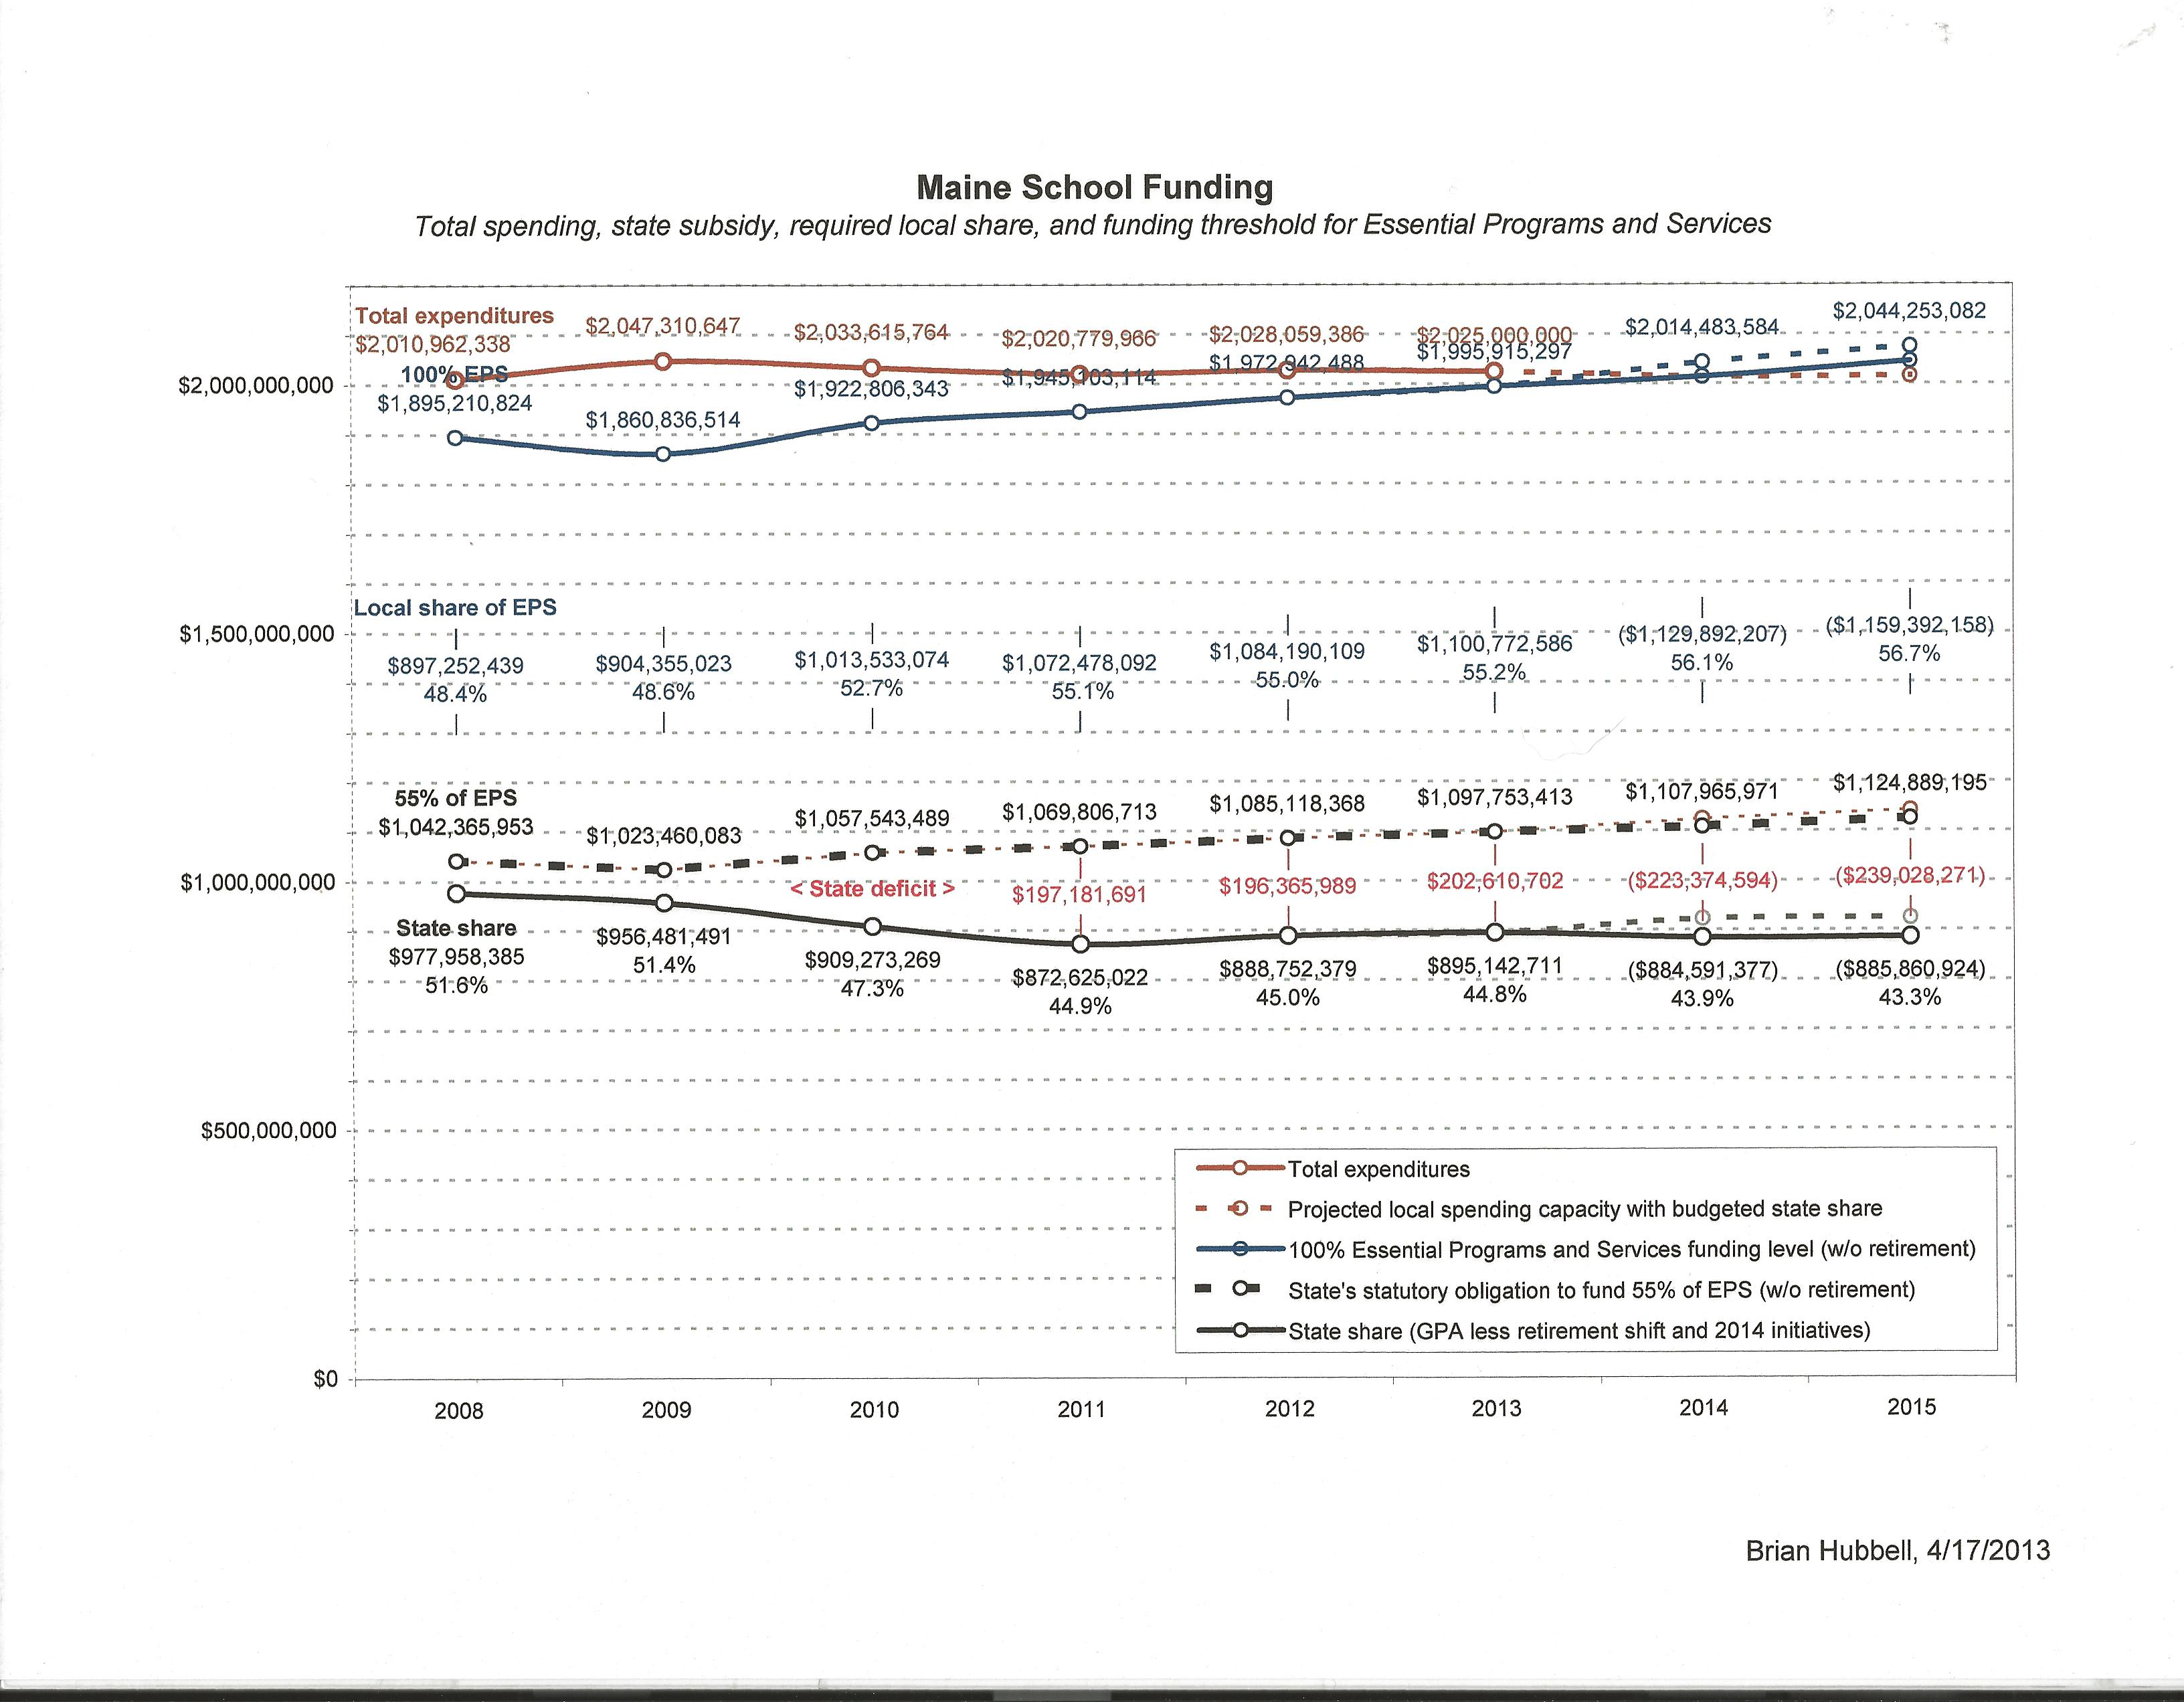 Maine-School-Funding-graph